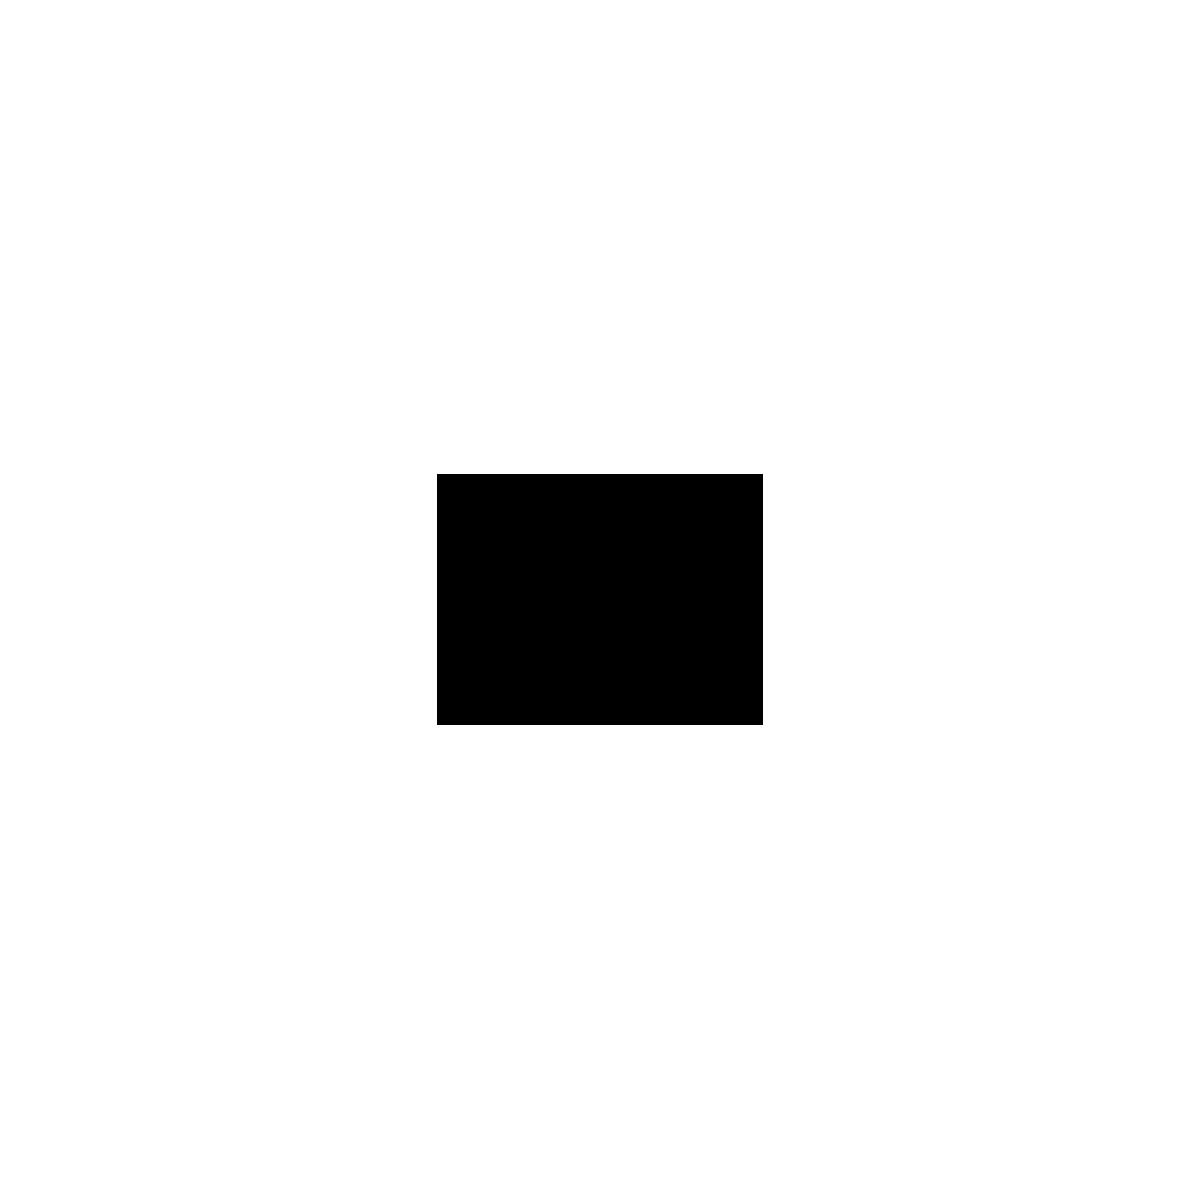 Deck_Patterns_68.png